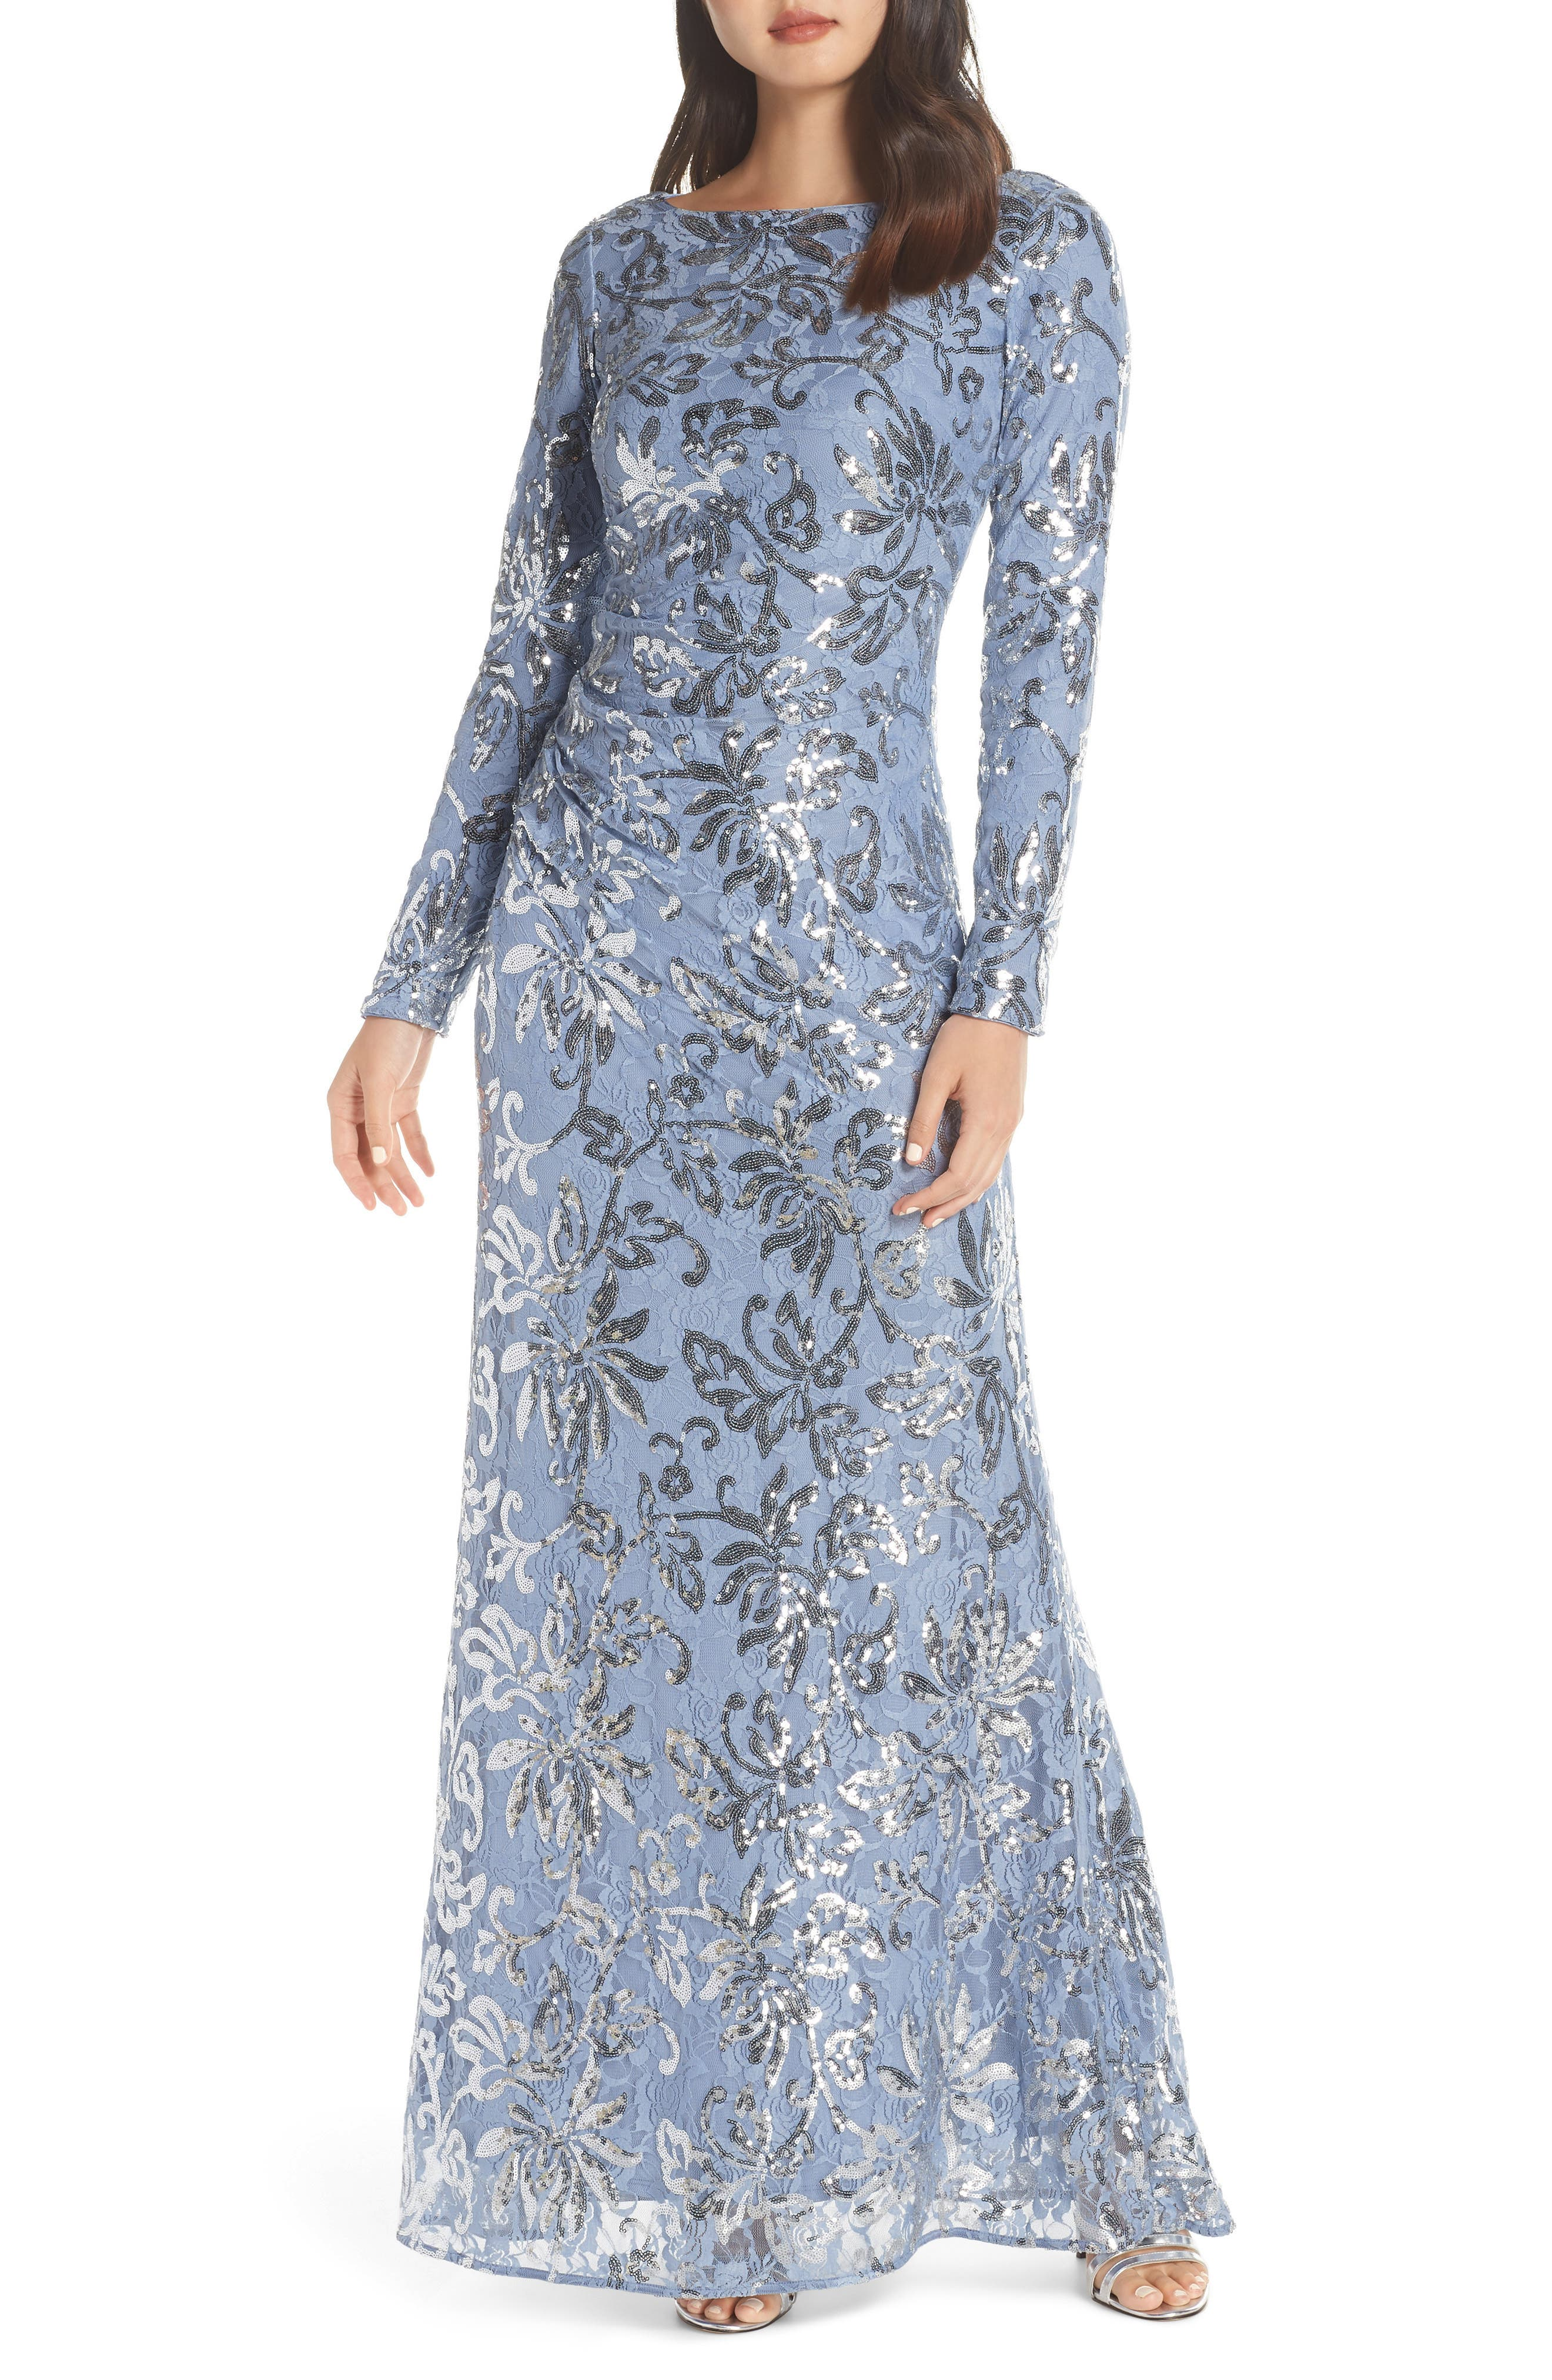 VINCE CAMUTO Lace & Sequin Evening Dress, Main, color, SKY BLUE